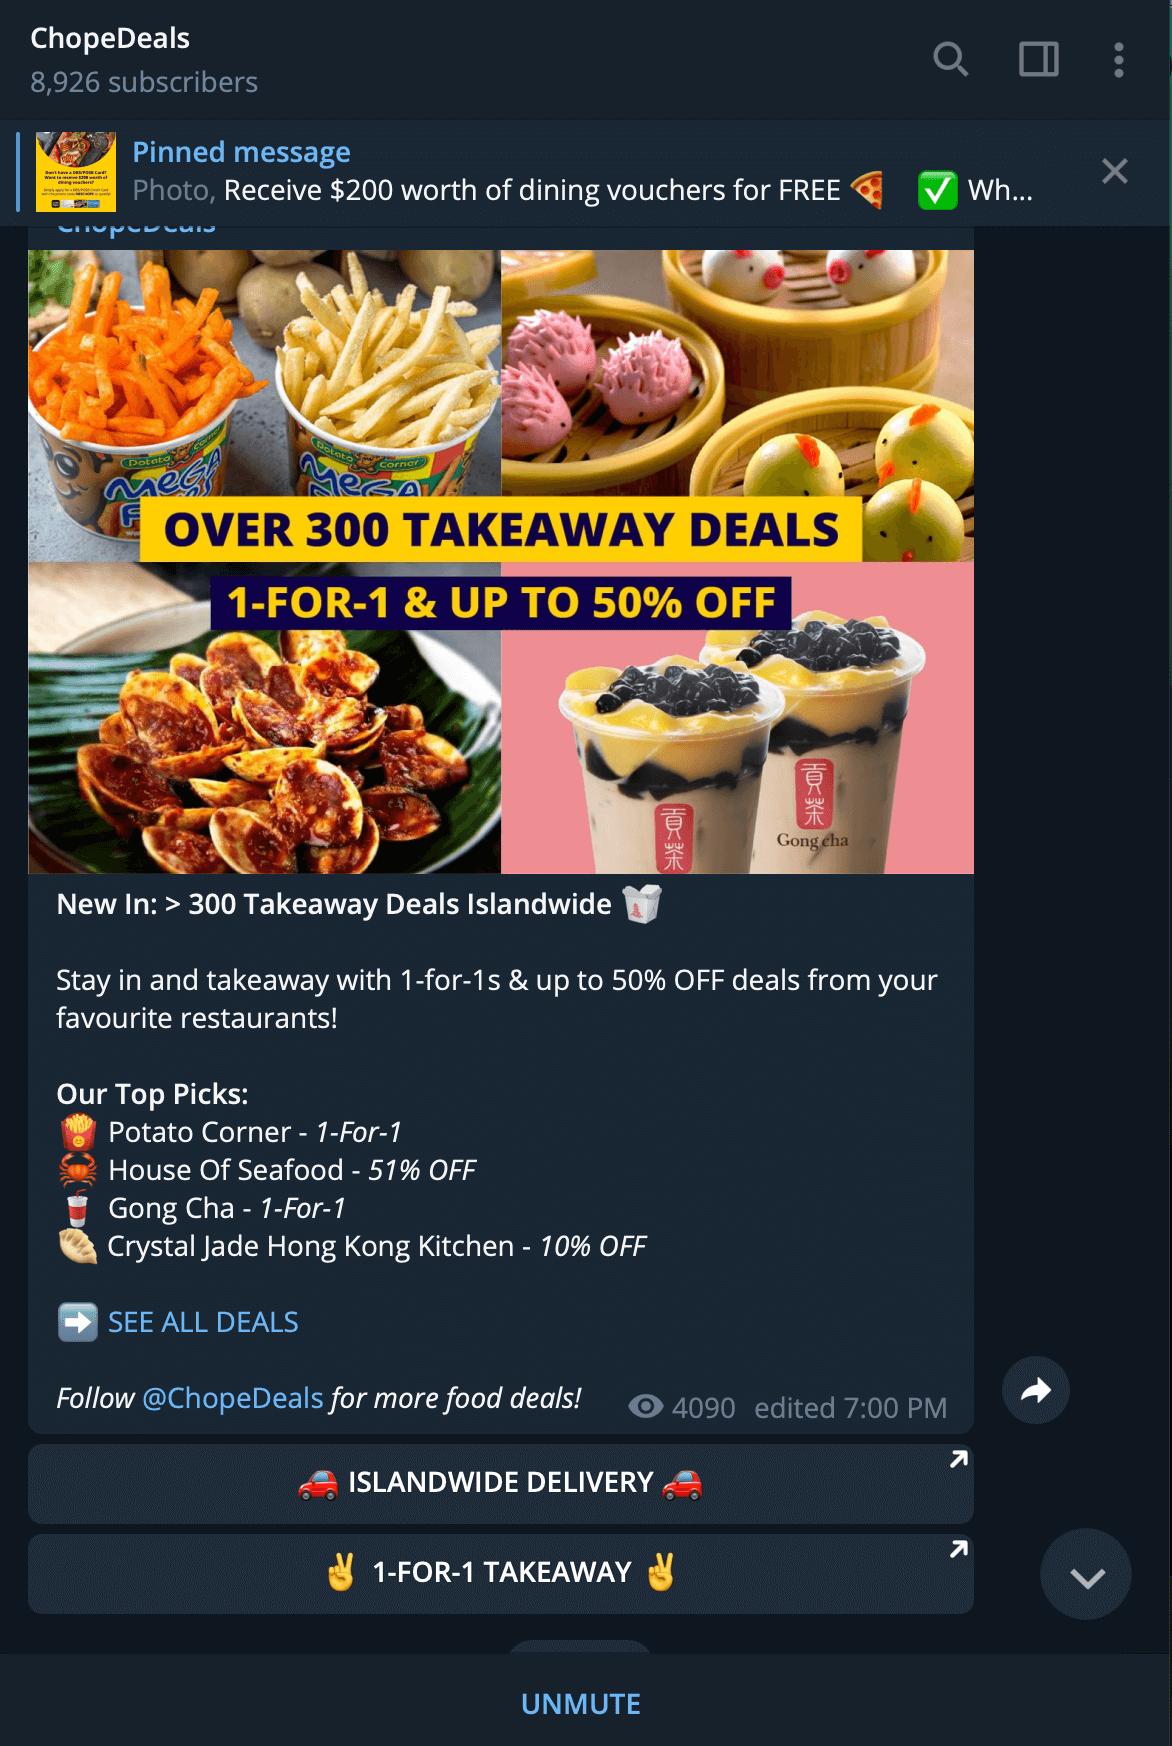 chopedeals, using telegram for f&b marketing